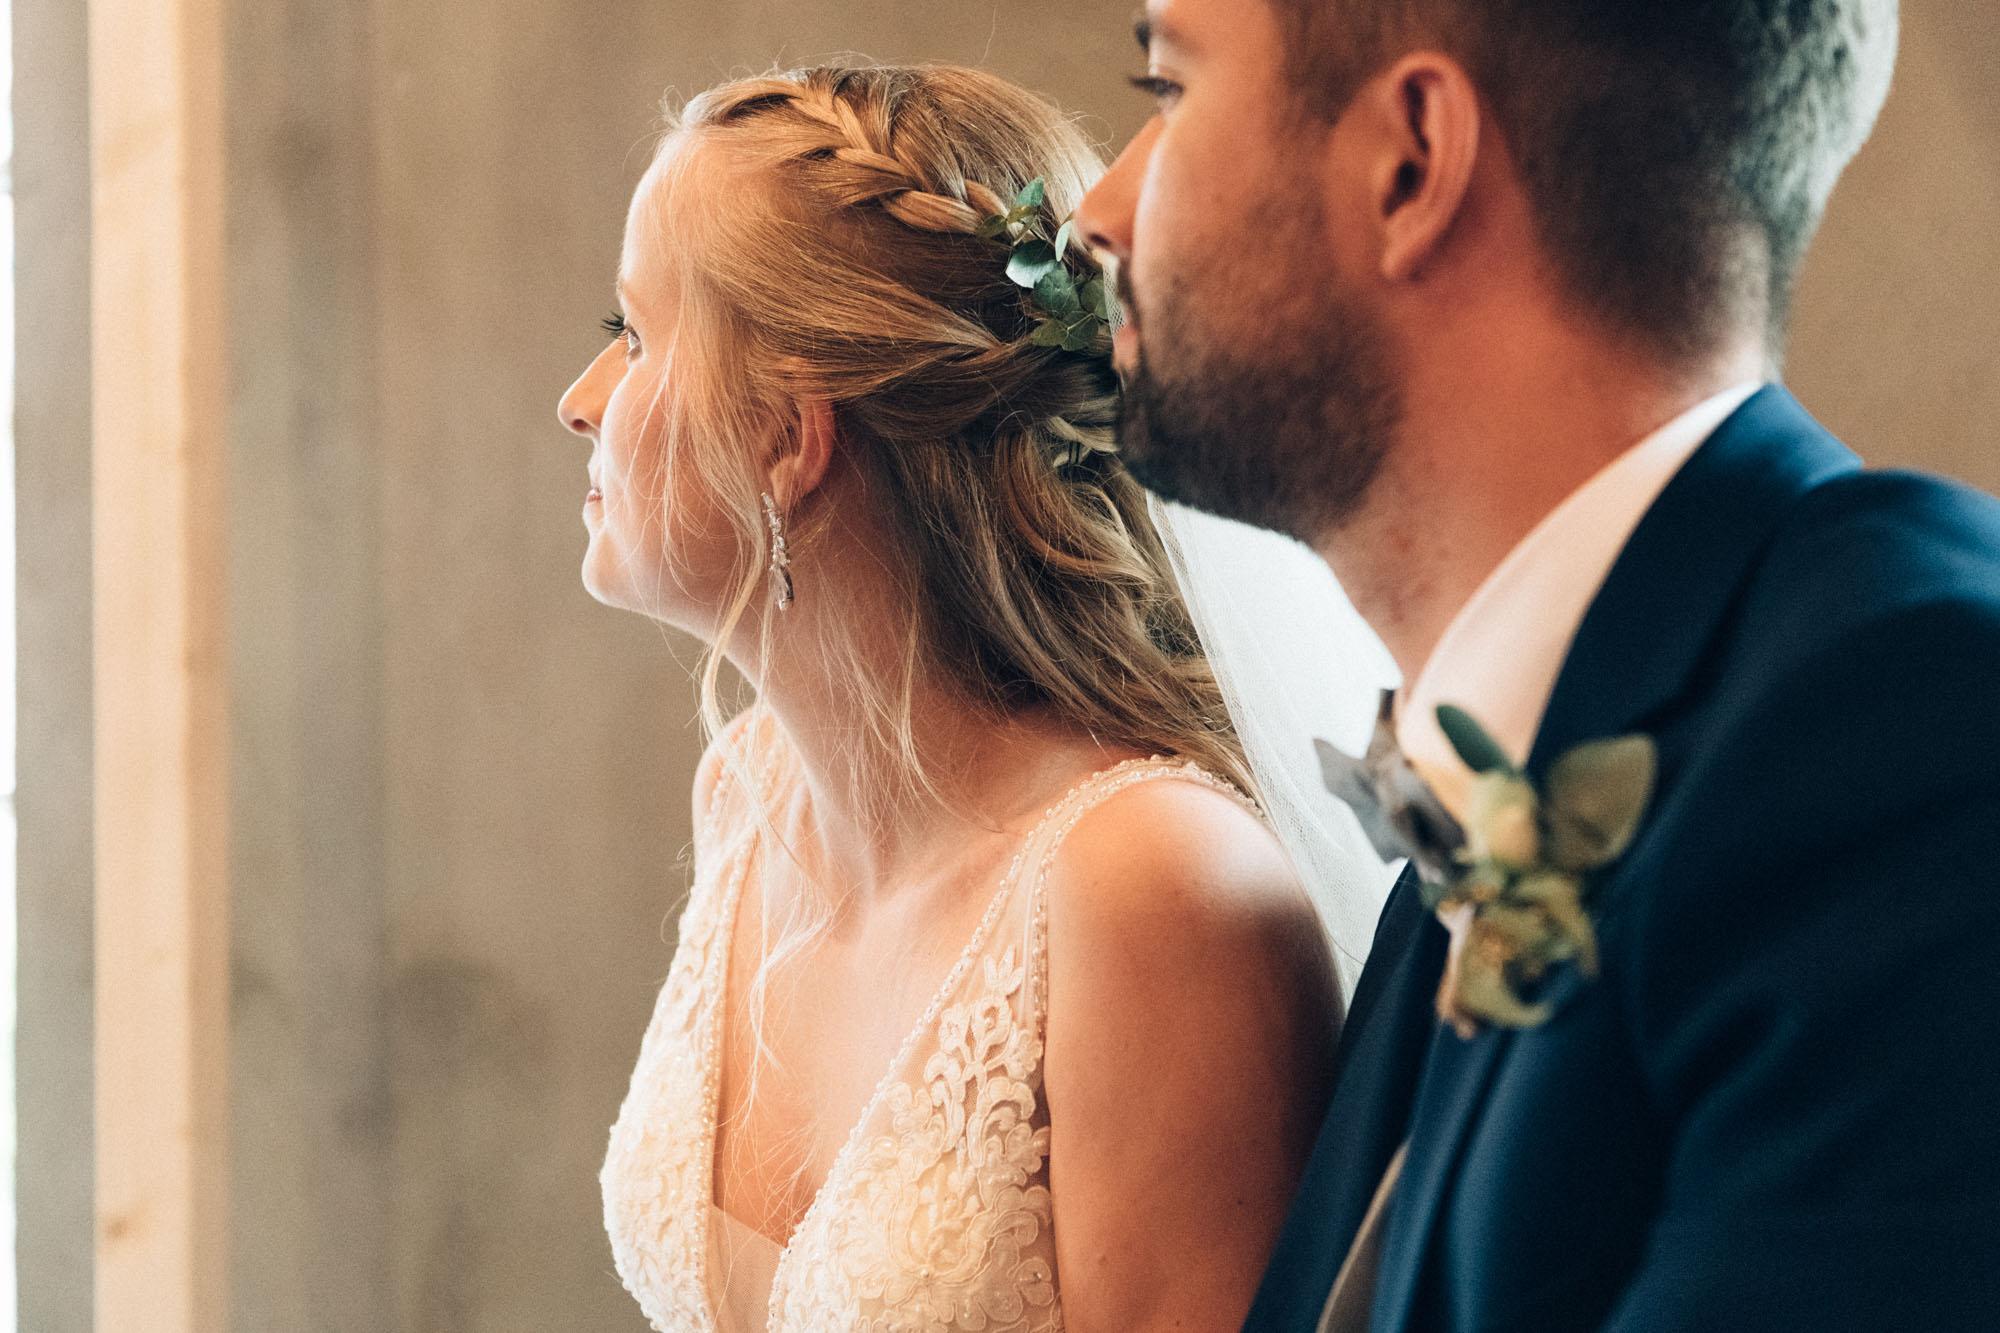 Huwelijksfotograaf-Oostende-Ceremonie-Elke-Bram